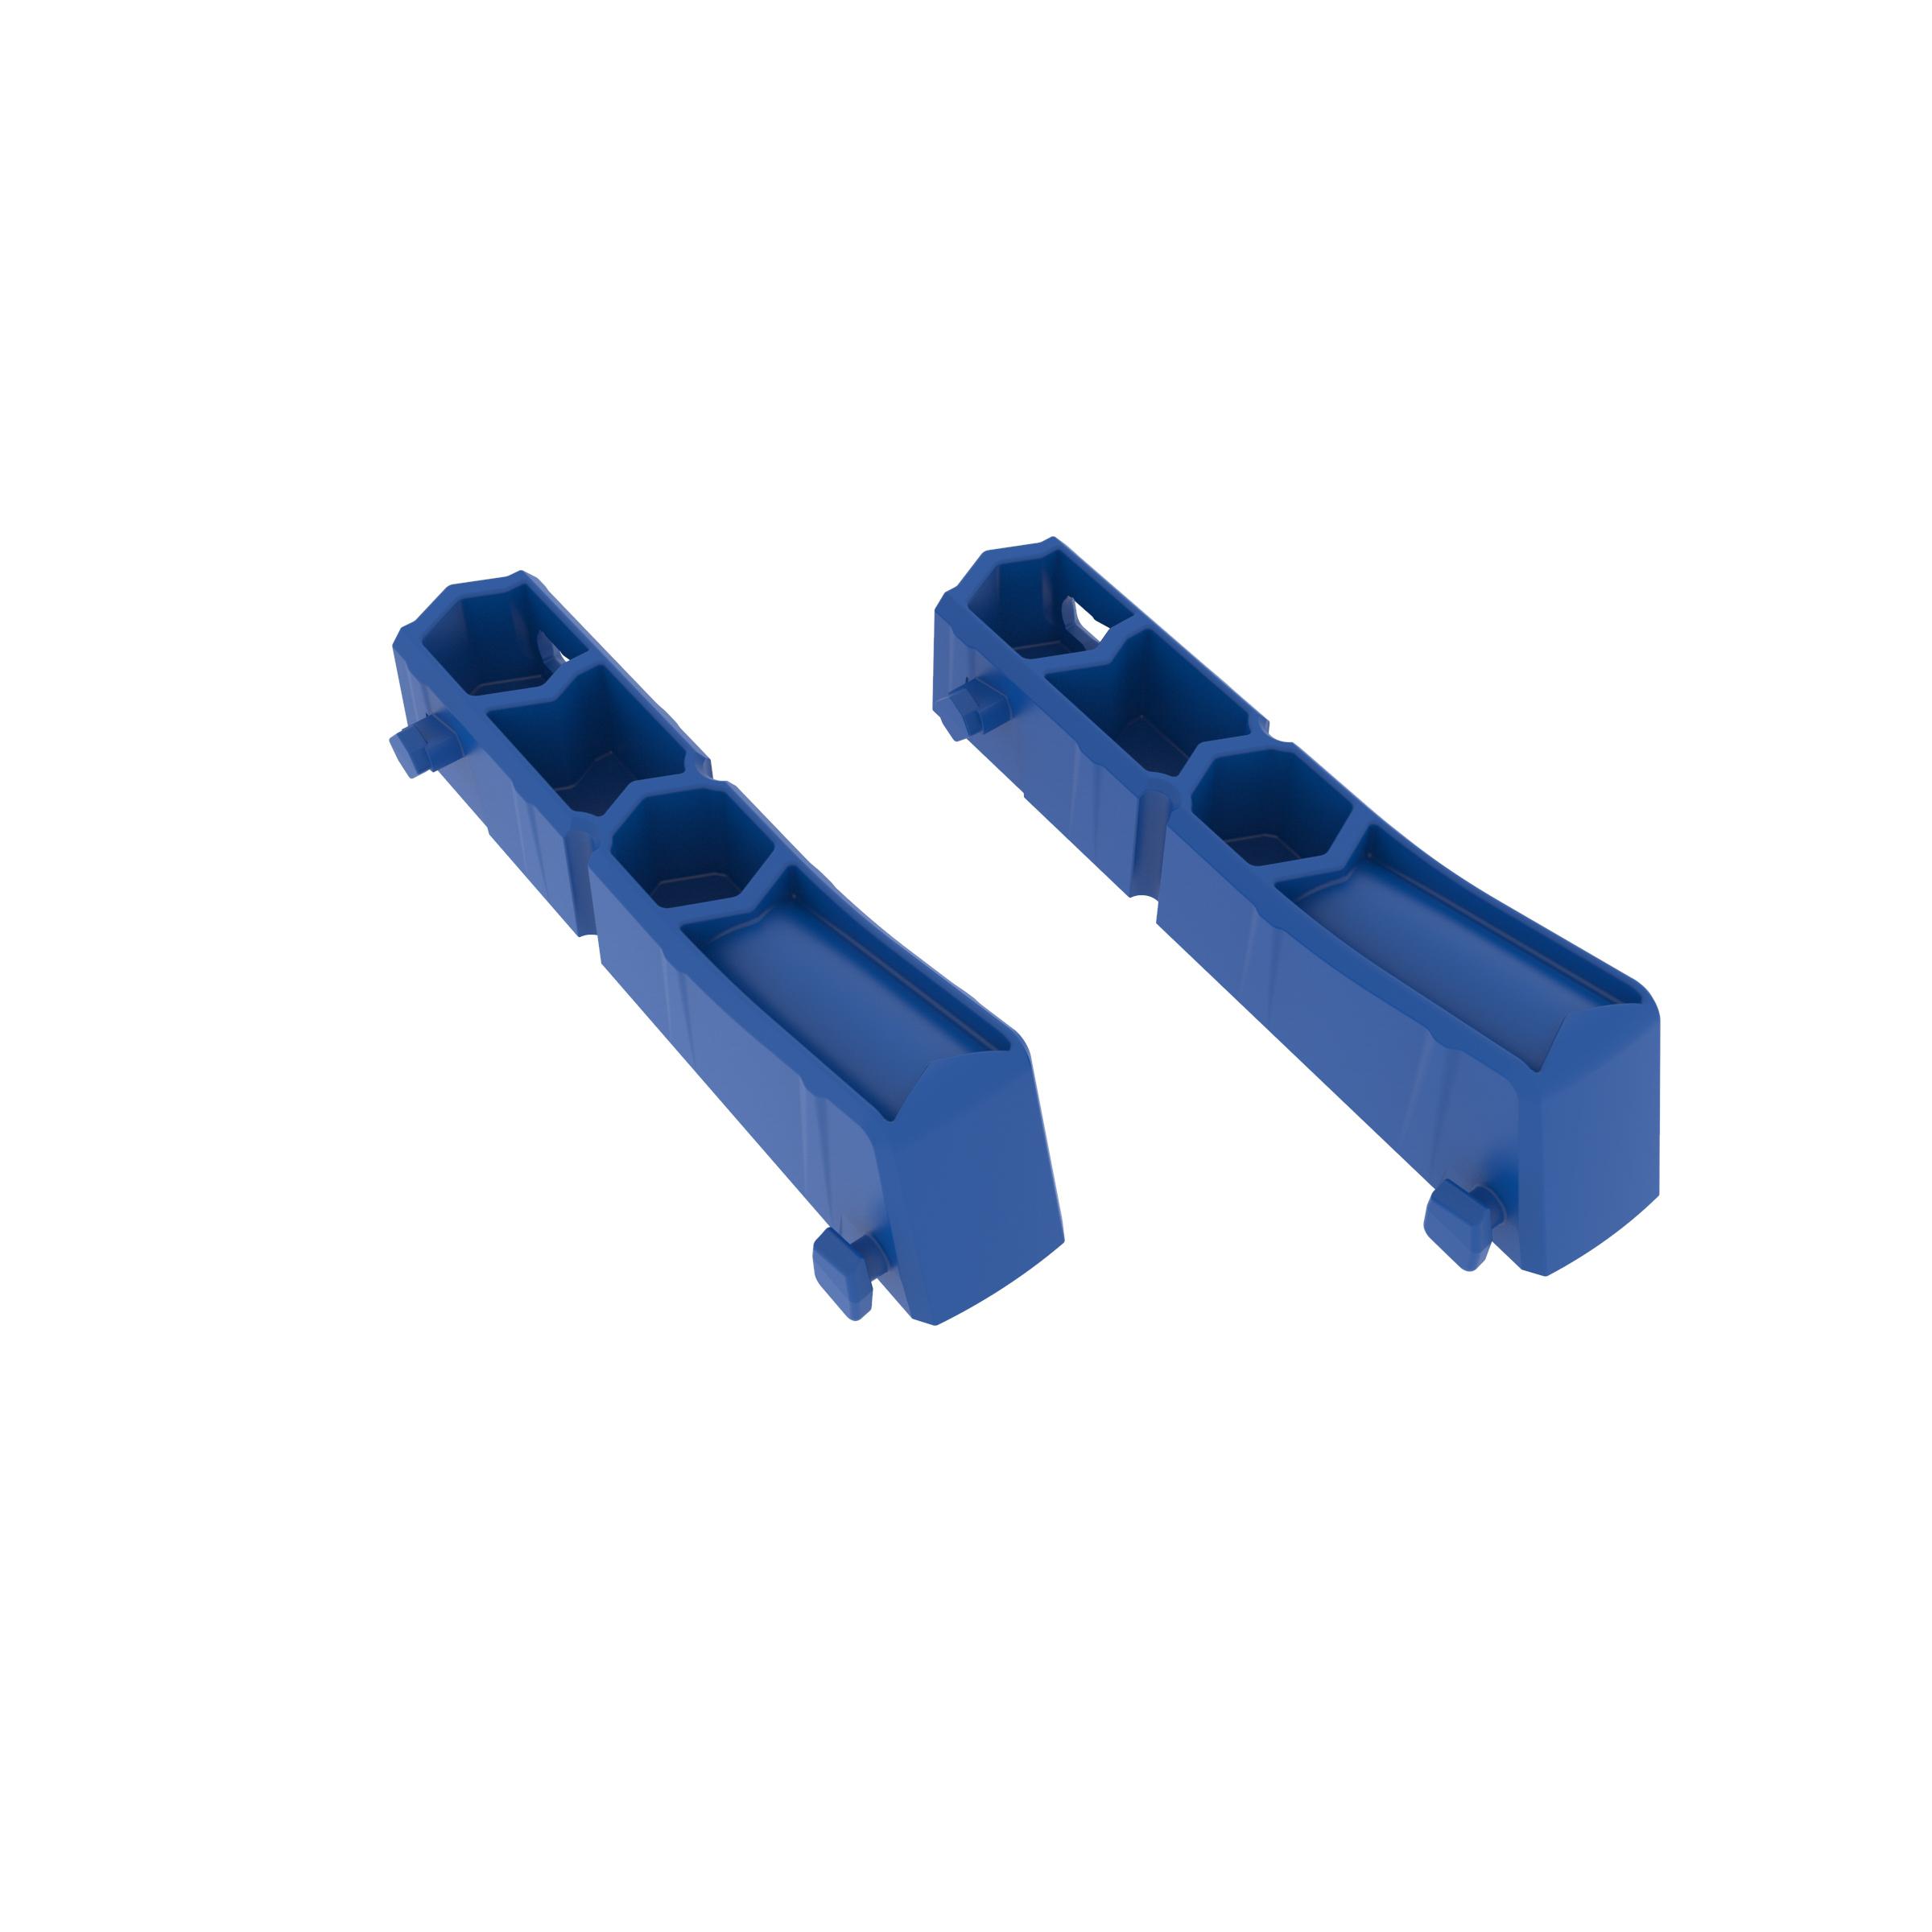 Kreg® Pocket-Hole Jig Spacers